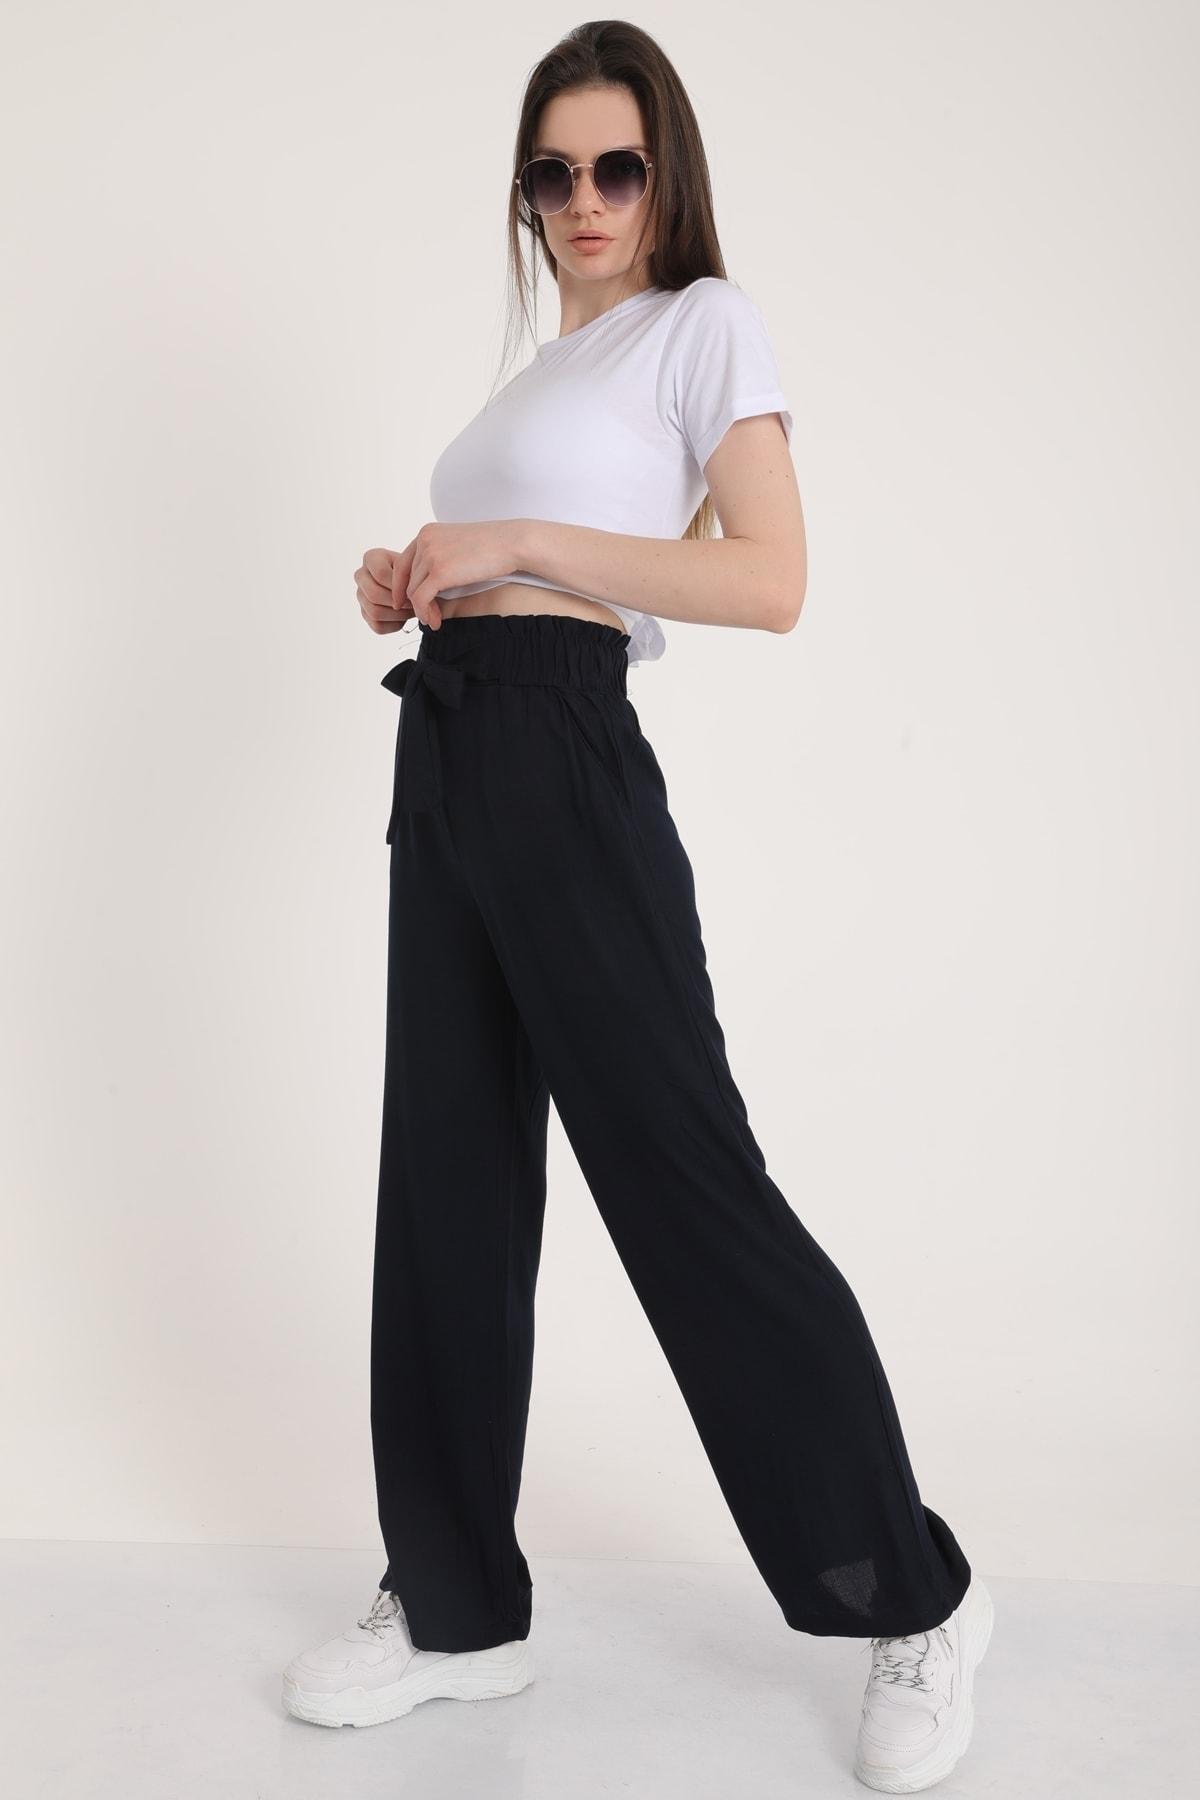 MD trend Kadın Lacivert Bel Lastikli Kemerli Salaş Pantolon  Mdt5181 1